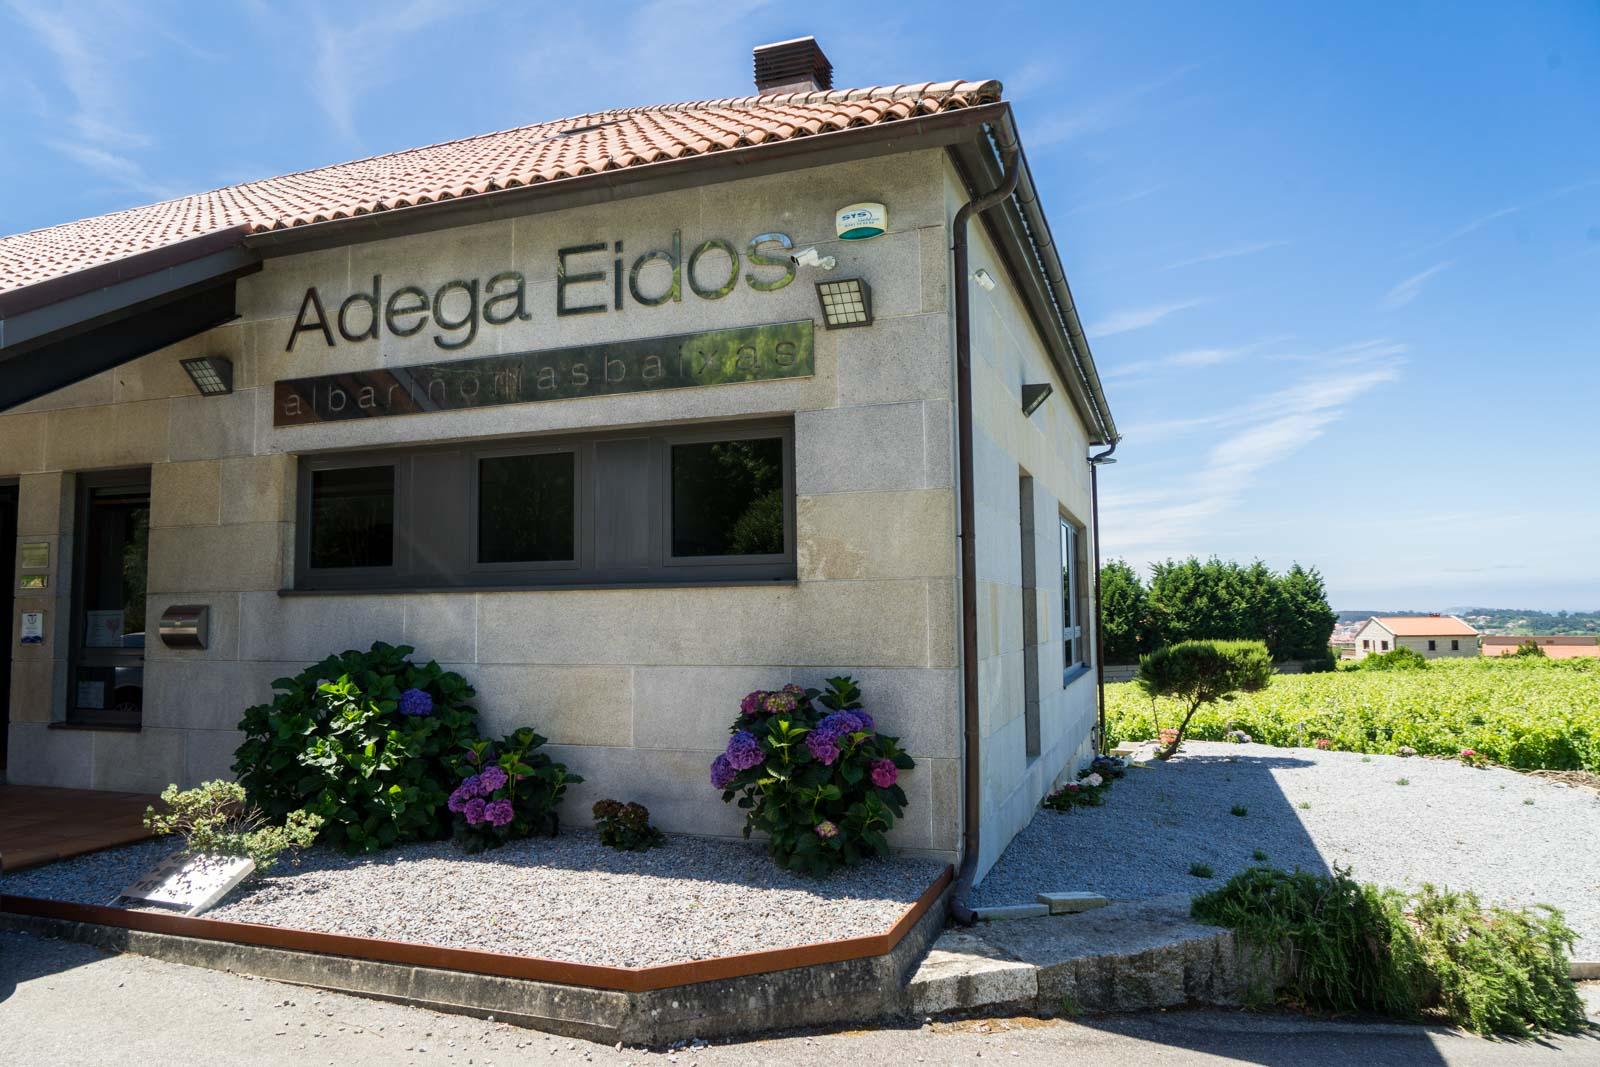 Adega Eidos, Galicia, Spain